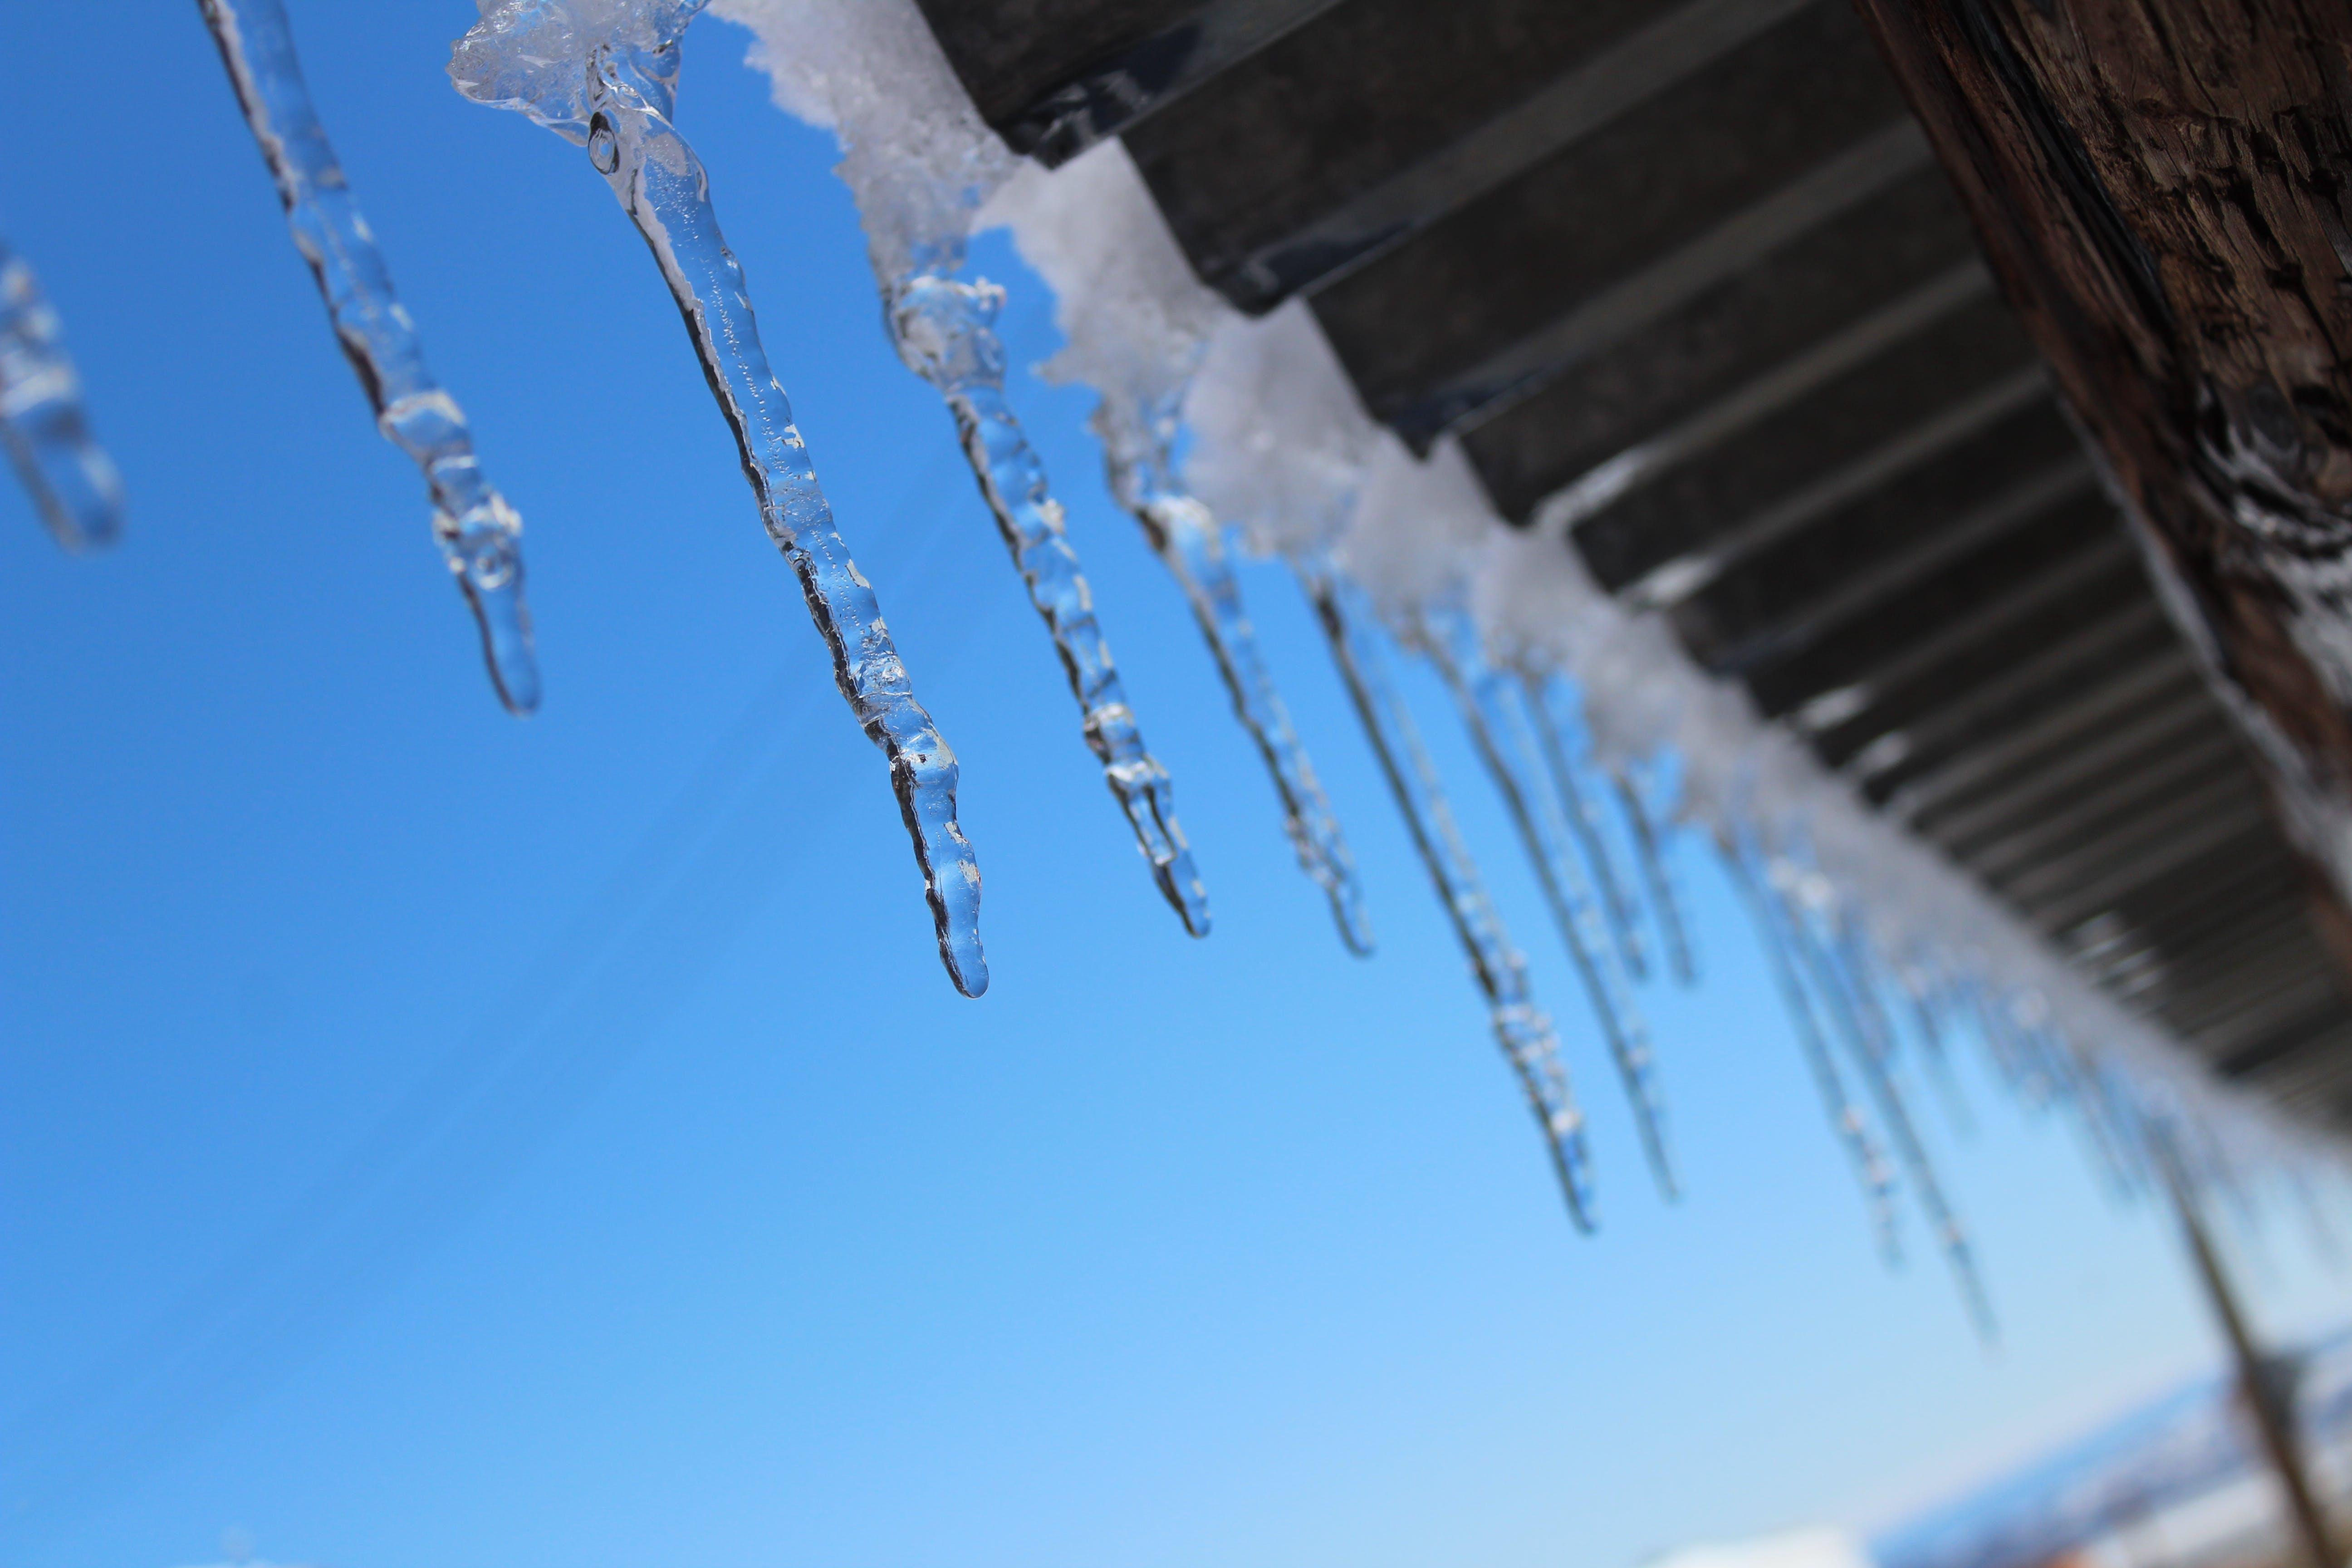 Free stock photo of ice, icicle, Joshua tree ca, snow